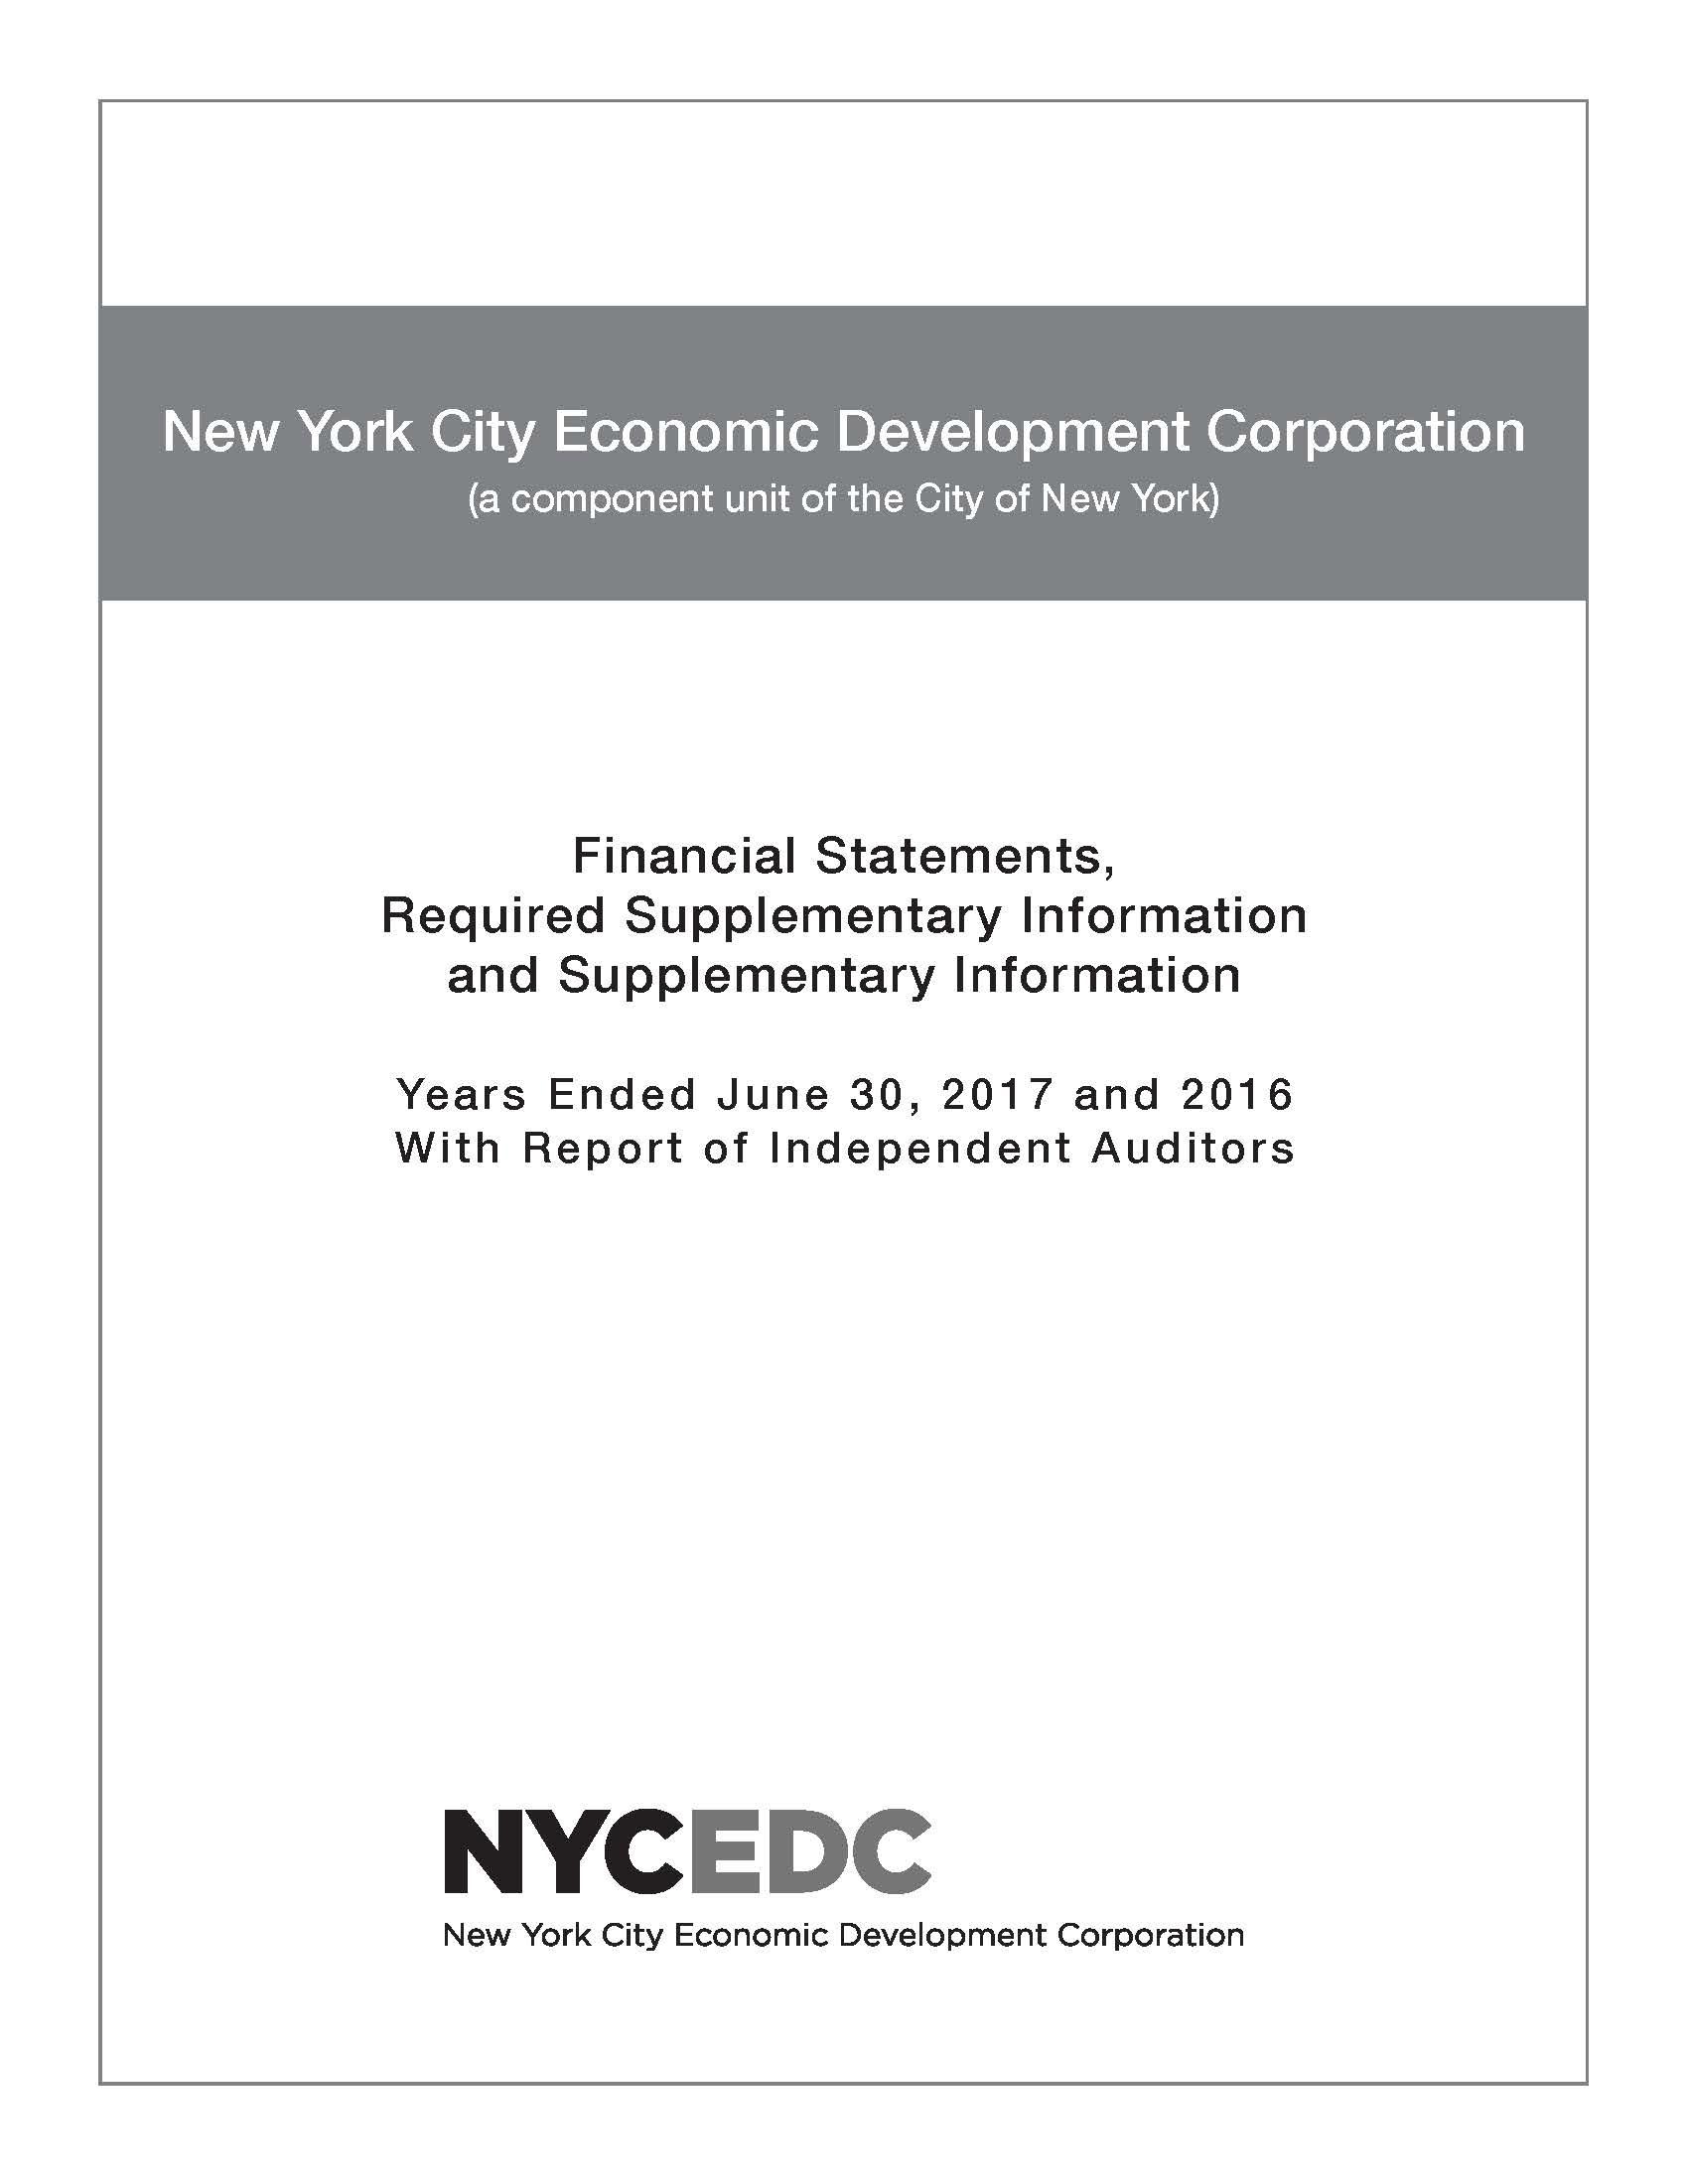 New York City Economic Development Corporation And Affiliates